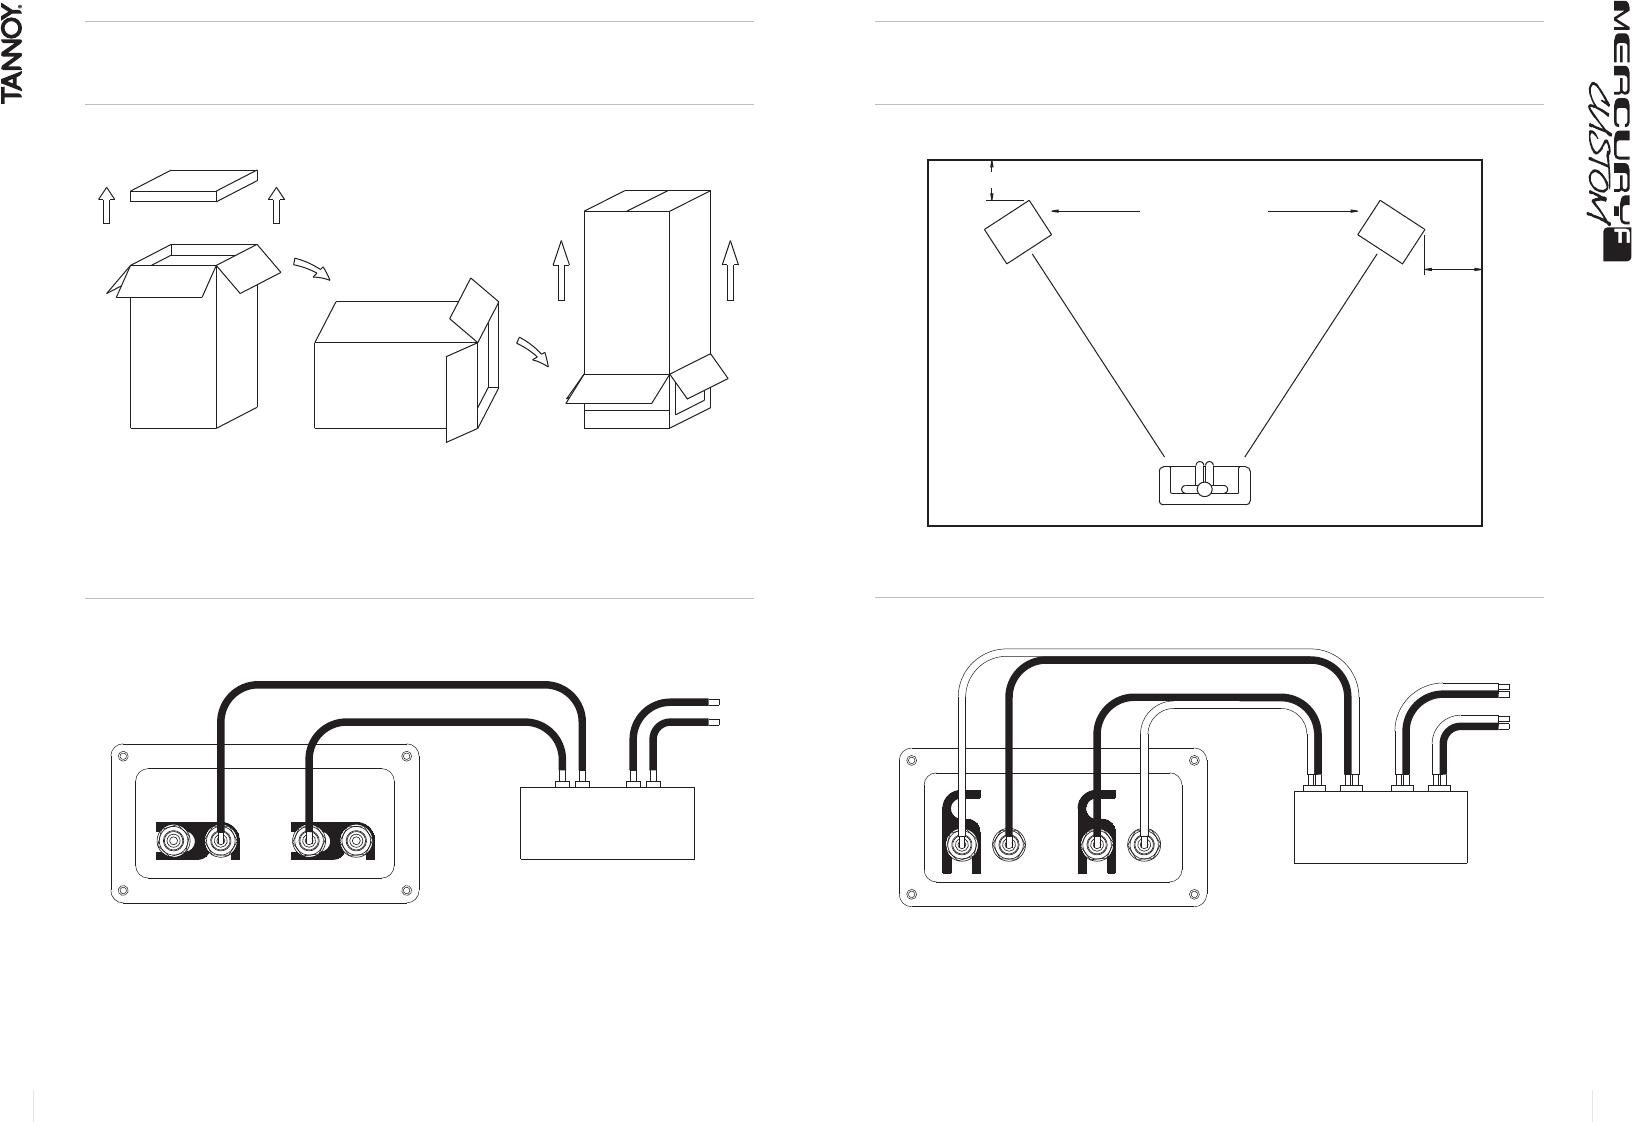 Tannoy Mercury F Custom User Manual To The 75ee08a1 eb0e